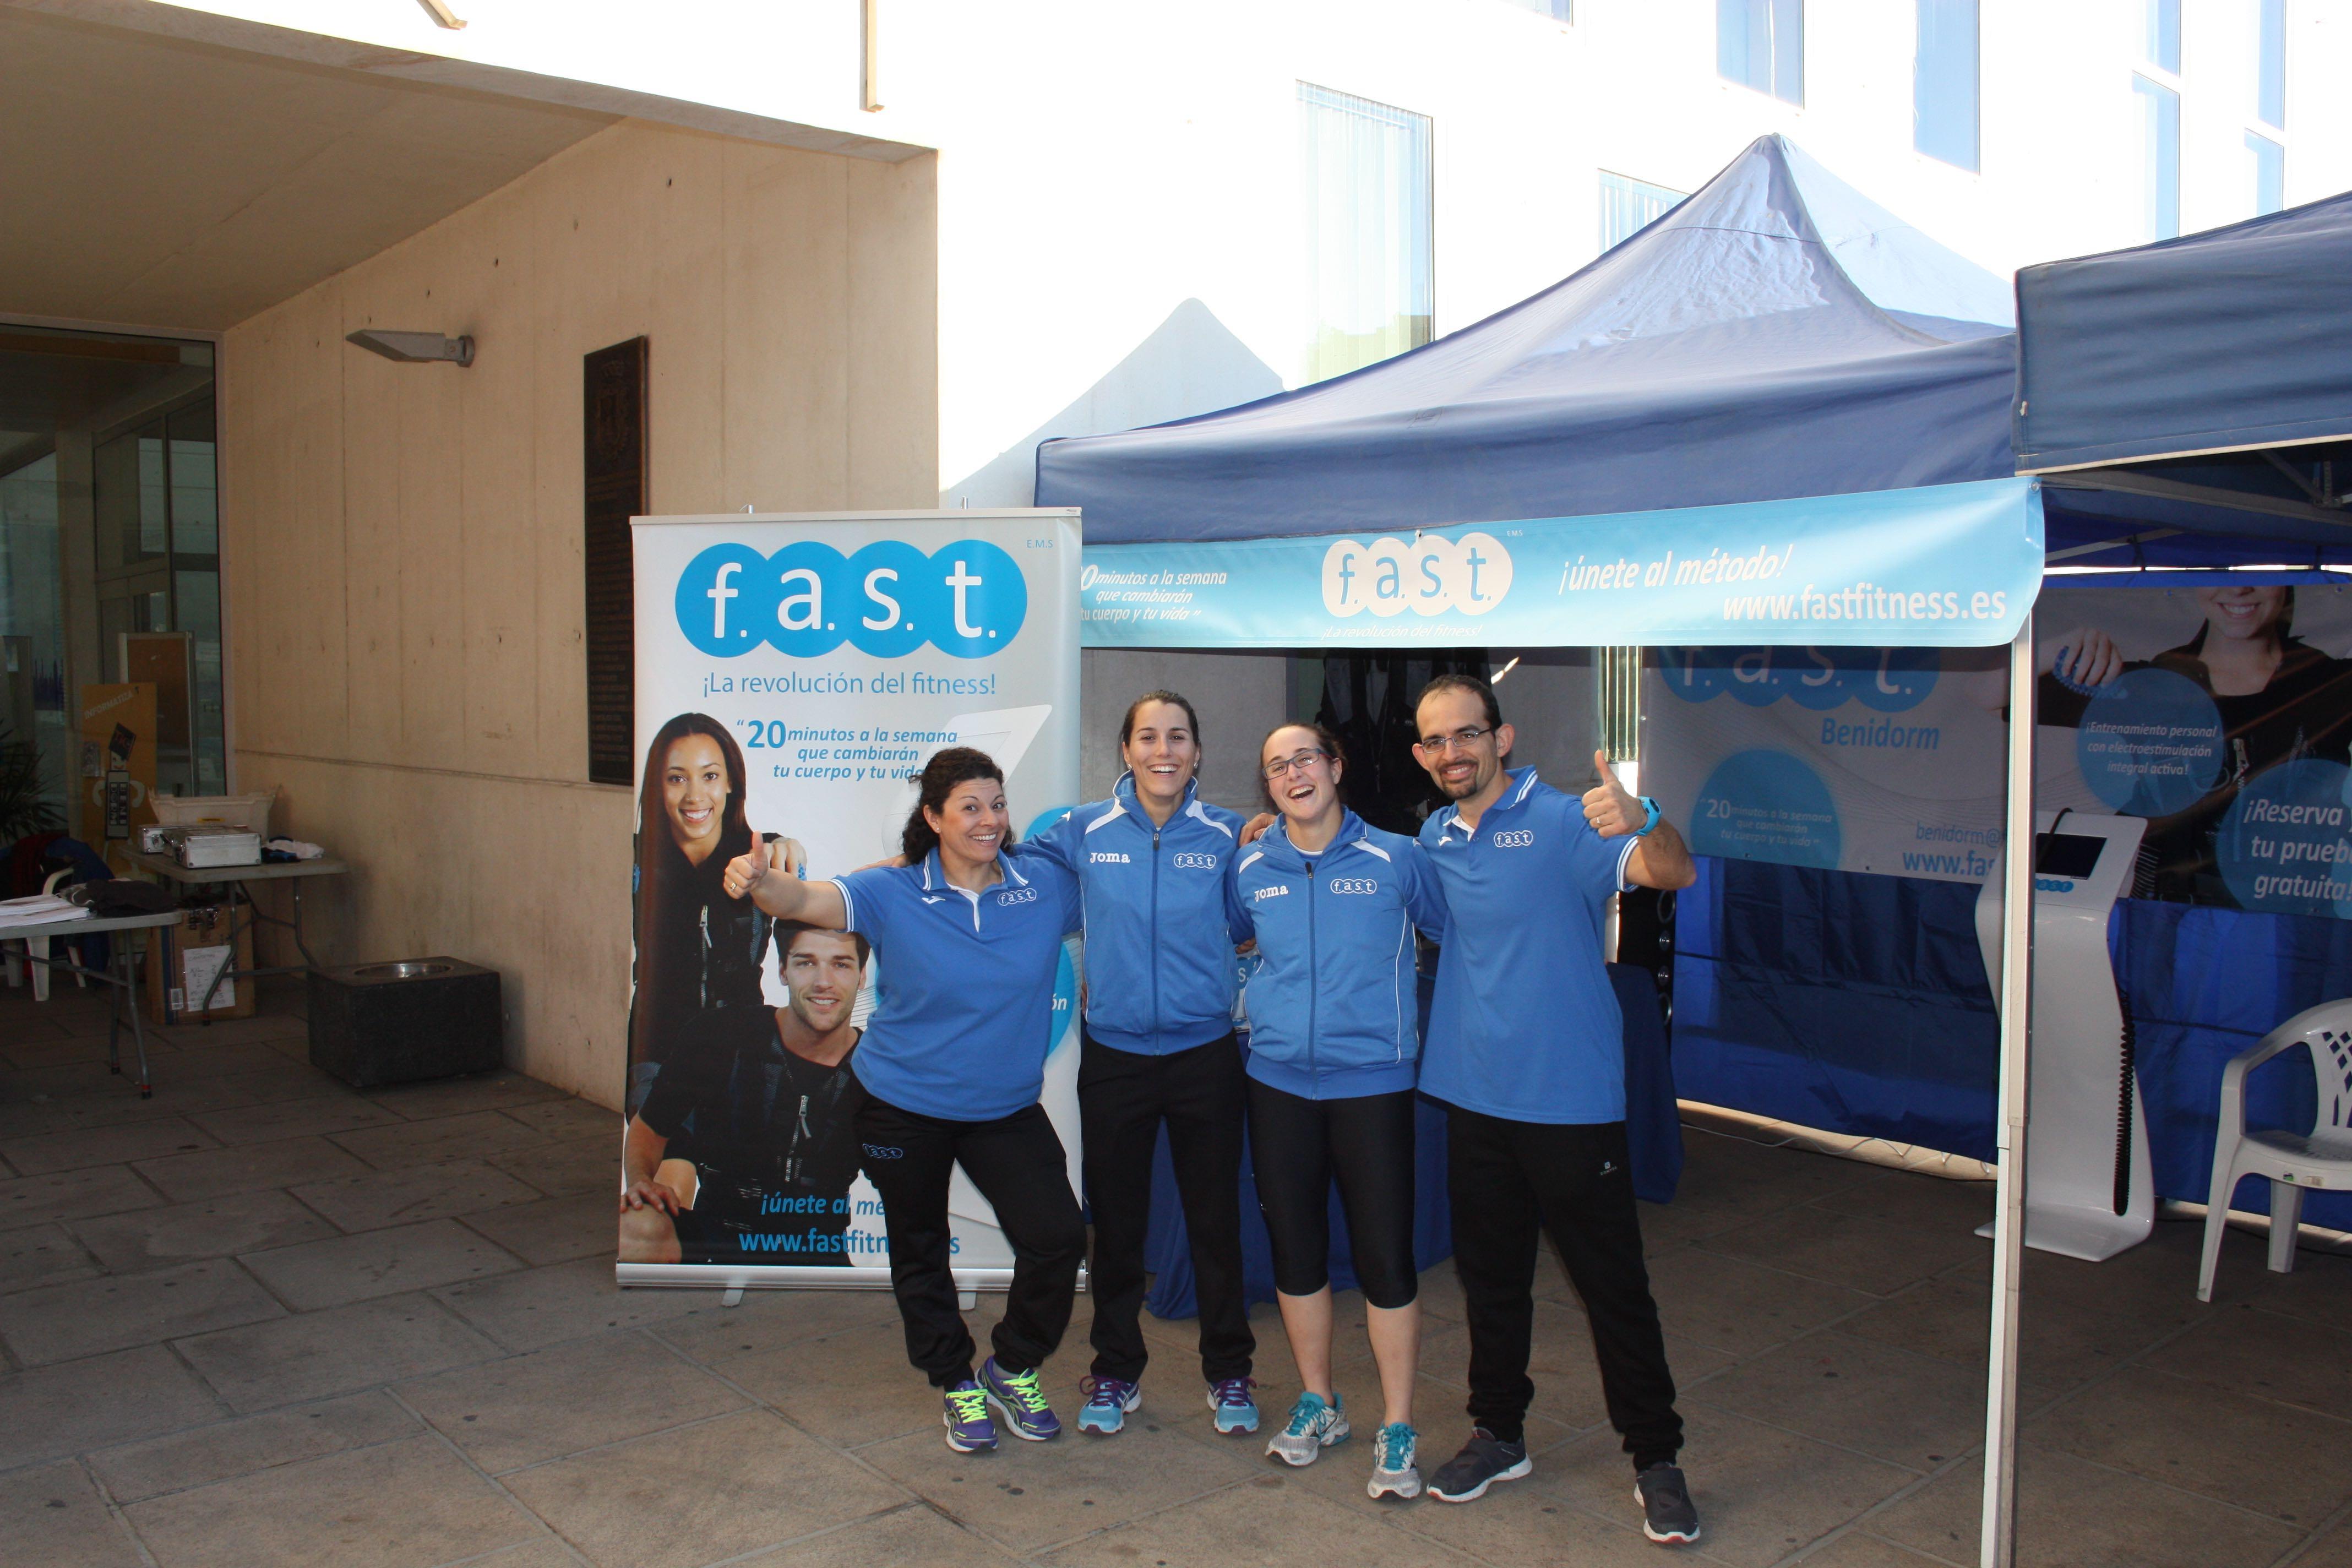 Equipo Fast Fitness Benidorm